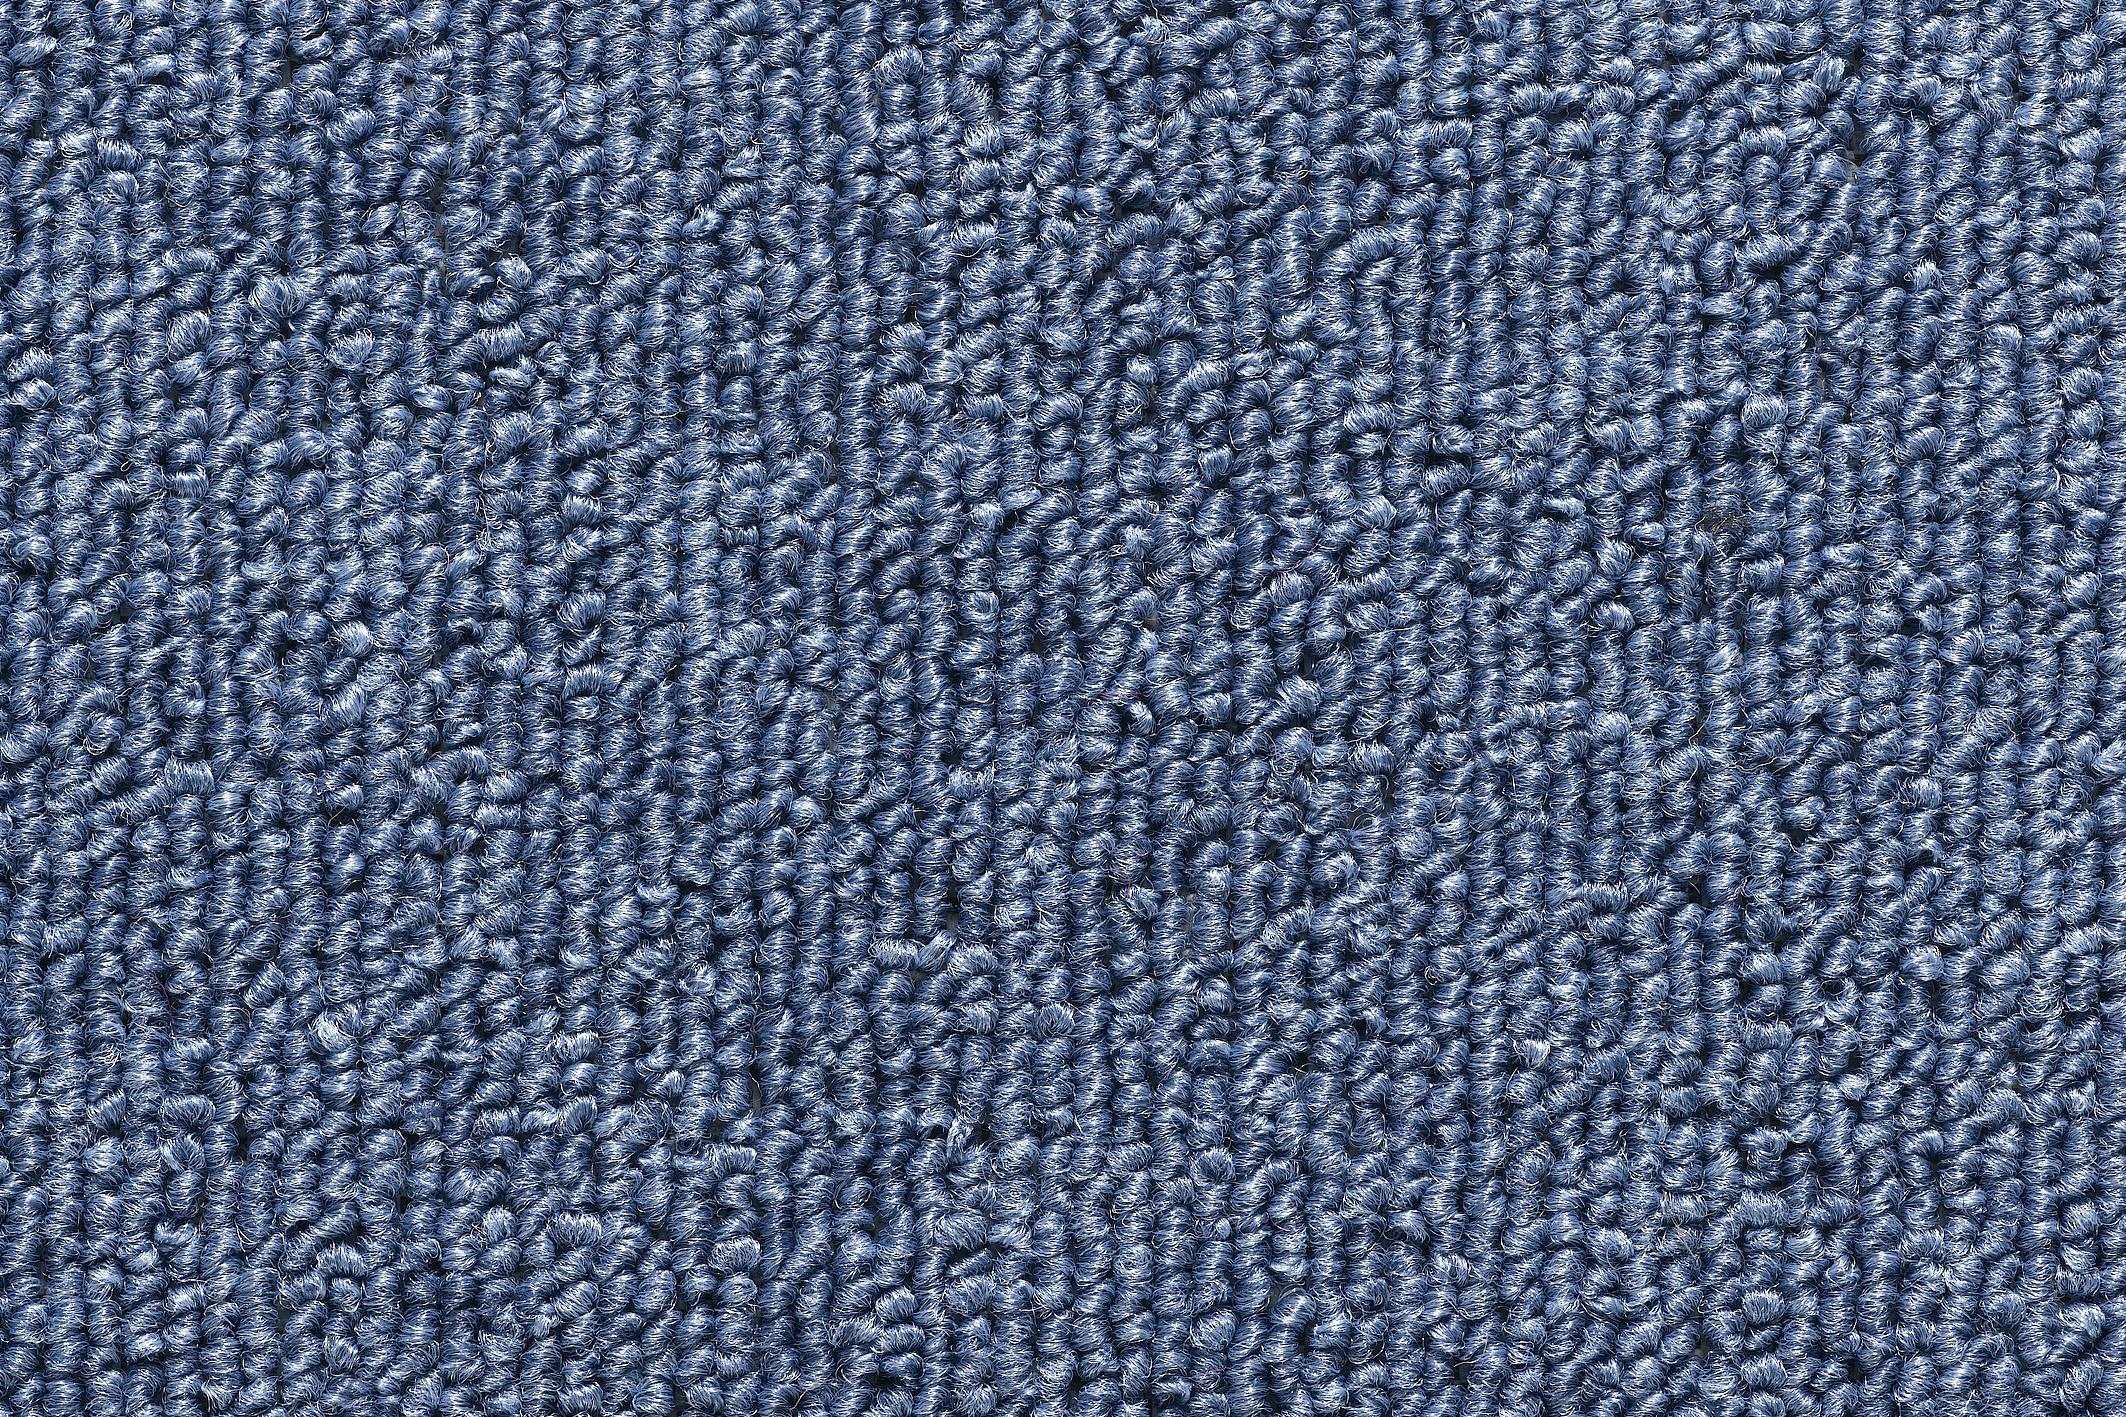 011 Jeans blue